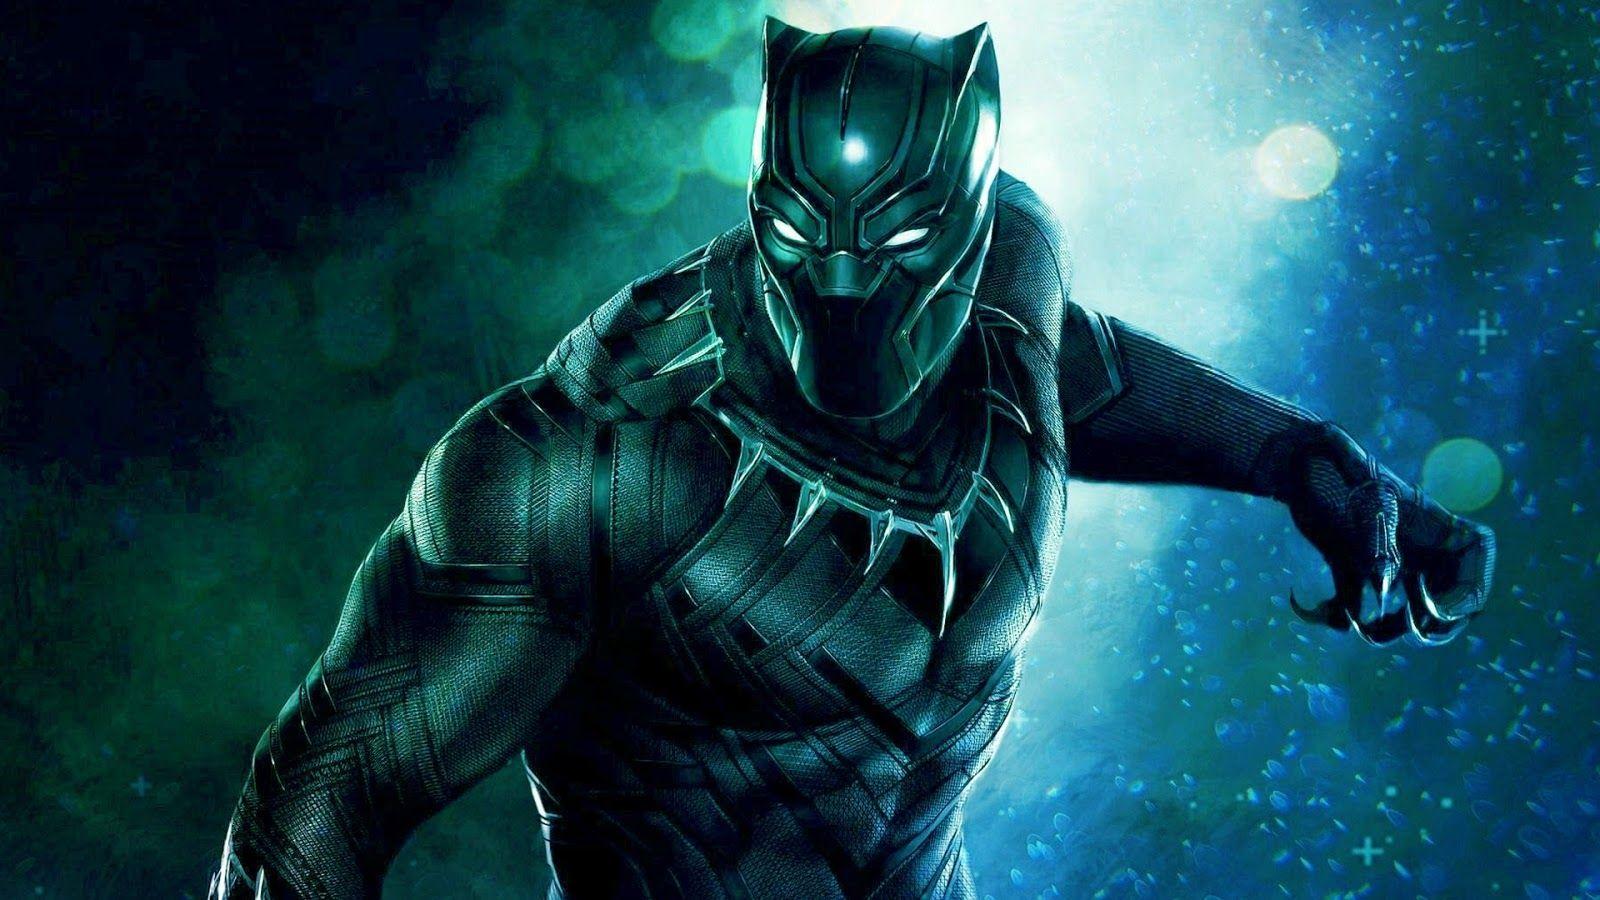 Pin By Moatz Diab On فورت نايت Black Panther Hd Wallpaper Black Panther Black Panther Marvel